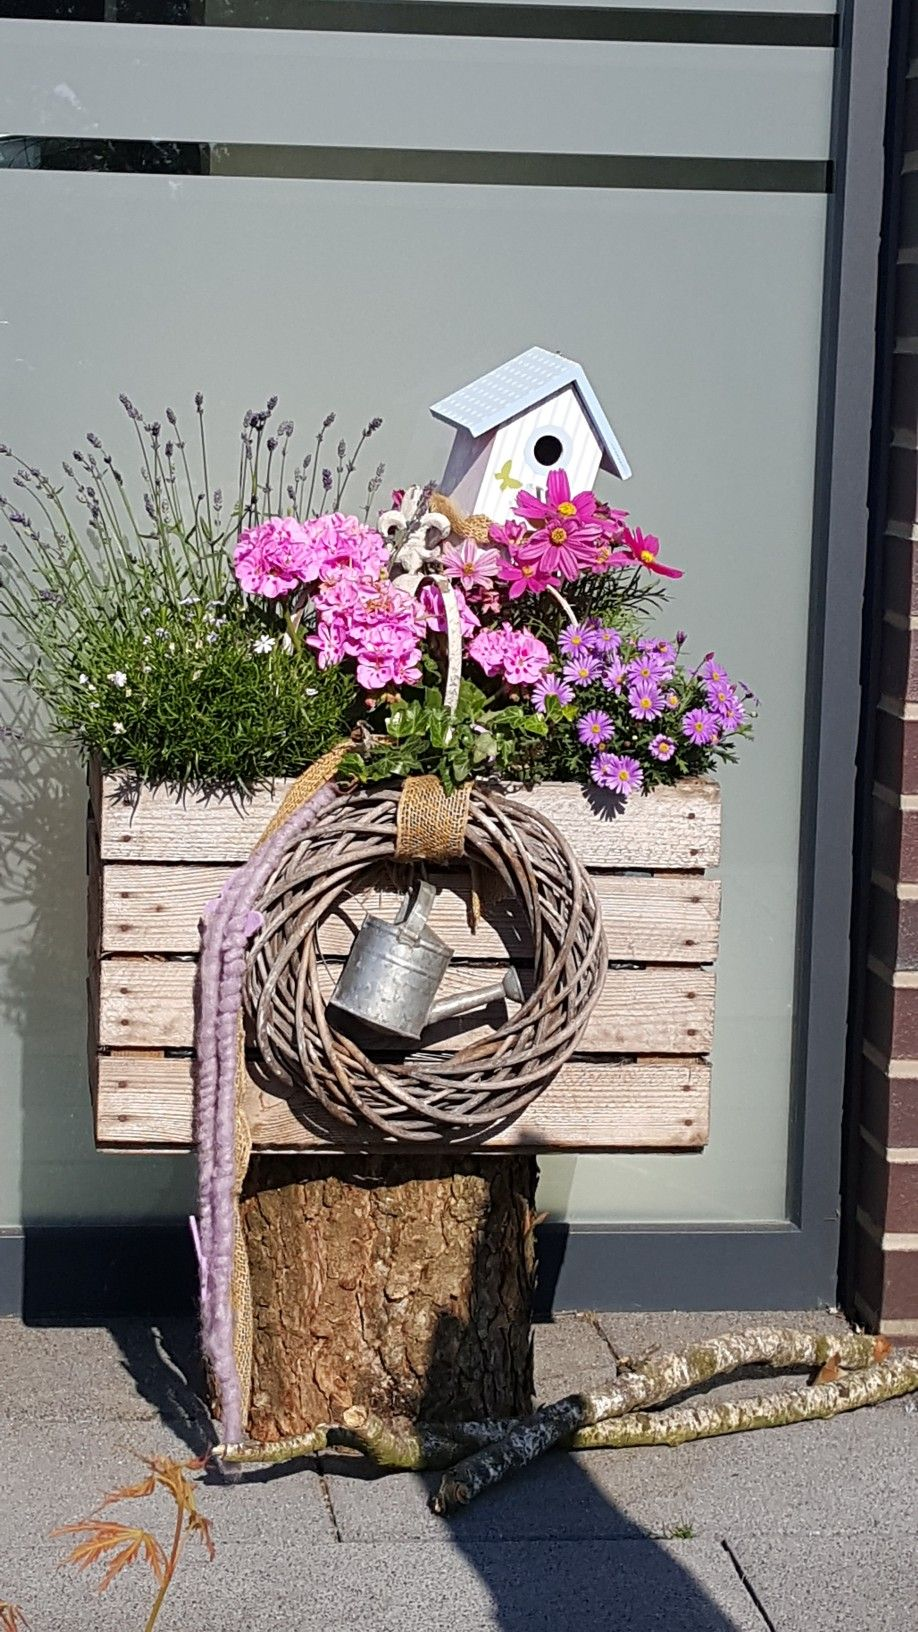 Deko Ideen Hauseingang Luxus sommerdeko Blumendeko Haustür Eingang Deko